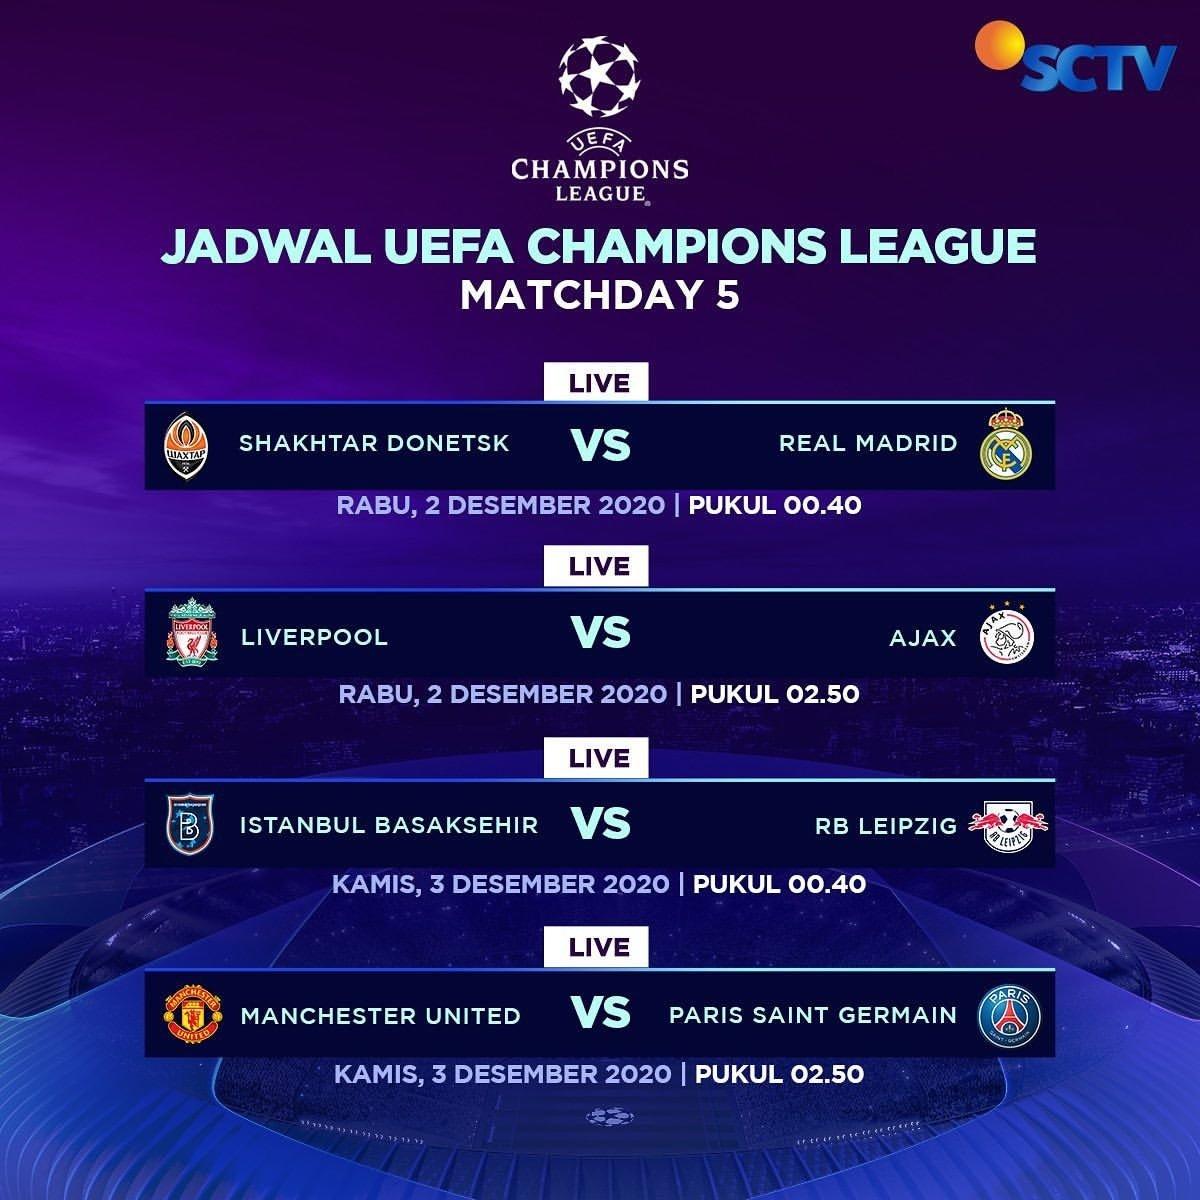 Next Match:  Manchester United vs PSG  Kamis 3 Desember 2020 Kick-Off 03:00 WIB Live on SCTV & Vidio  #MUFC #UCL